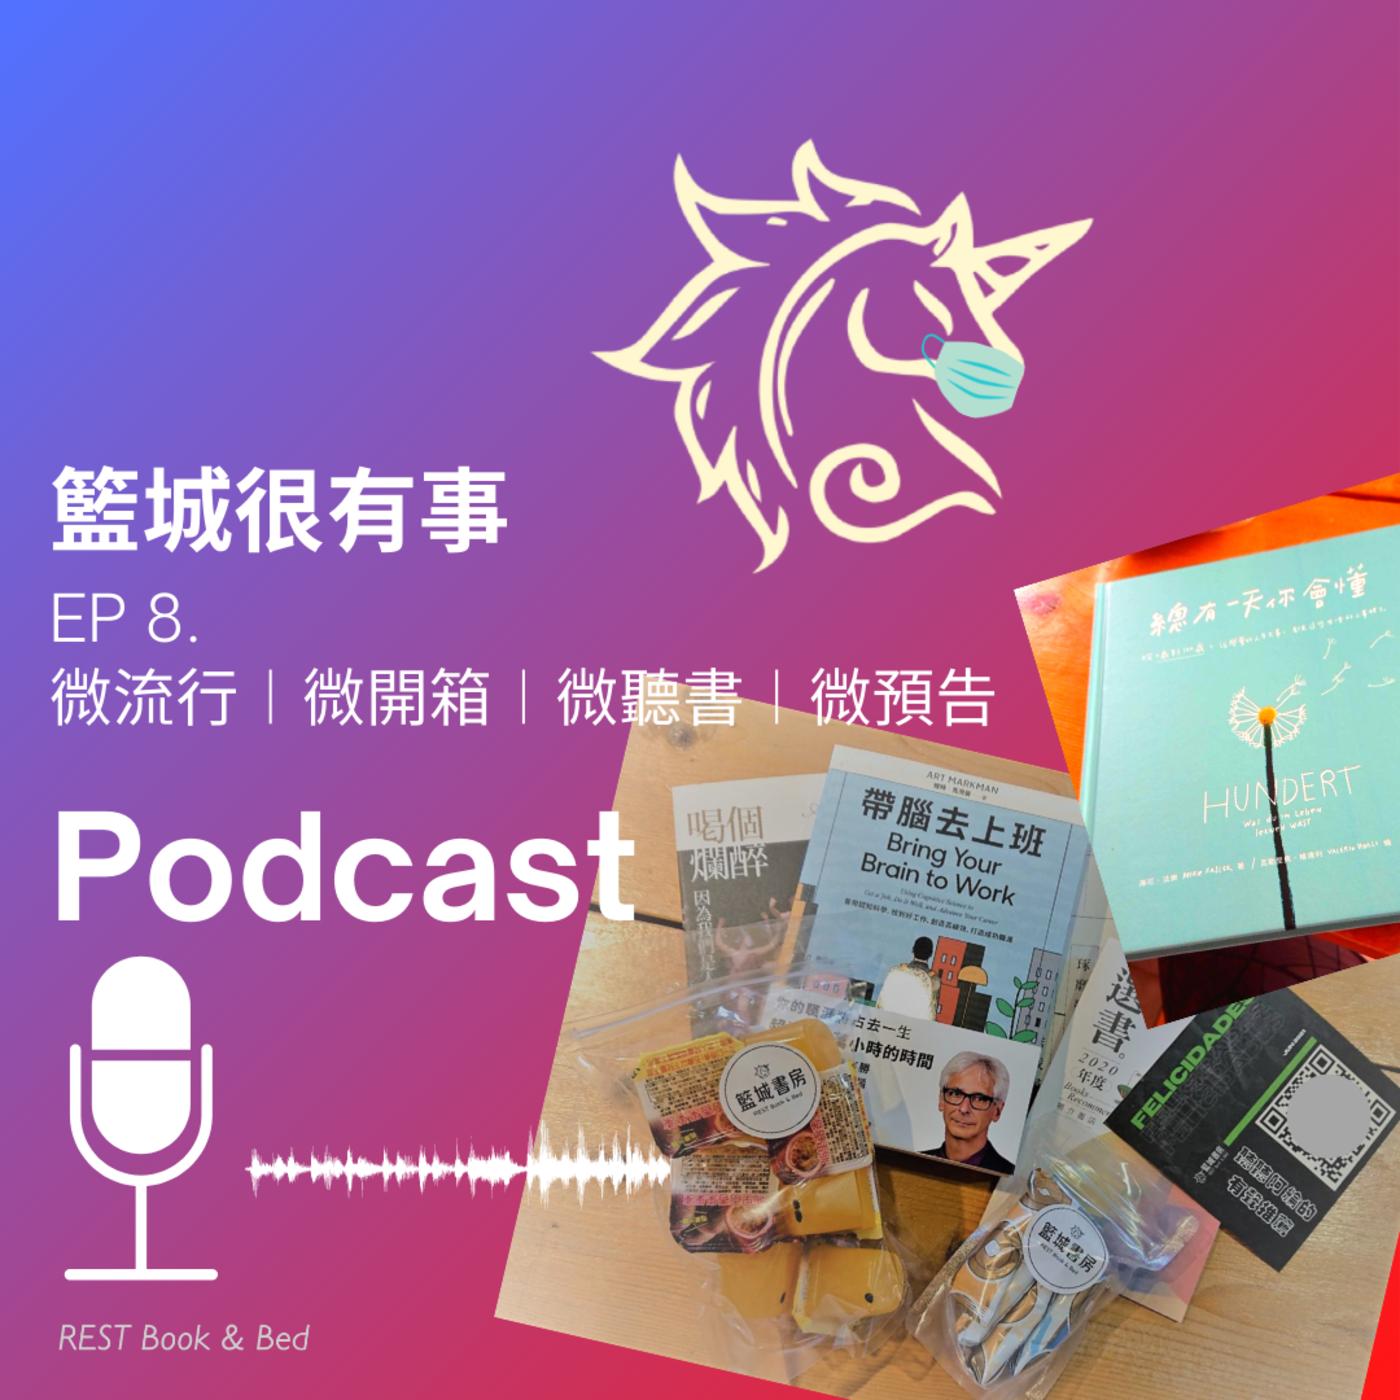 EP.8 微流行︱微開箱︱微聽書︱微預告